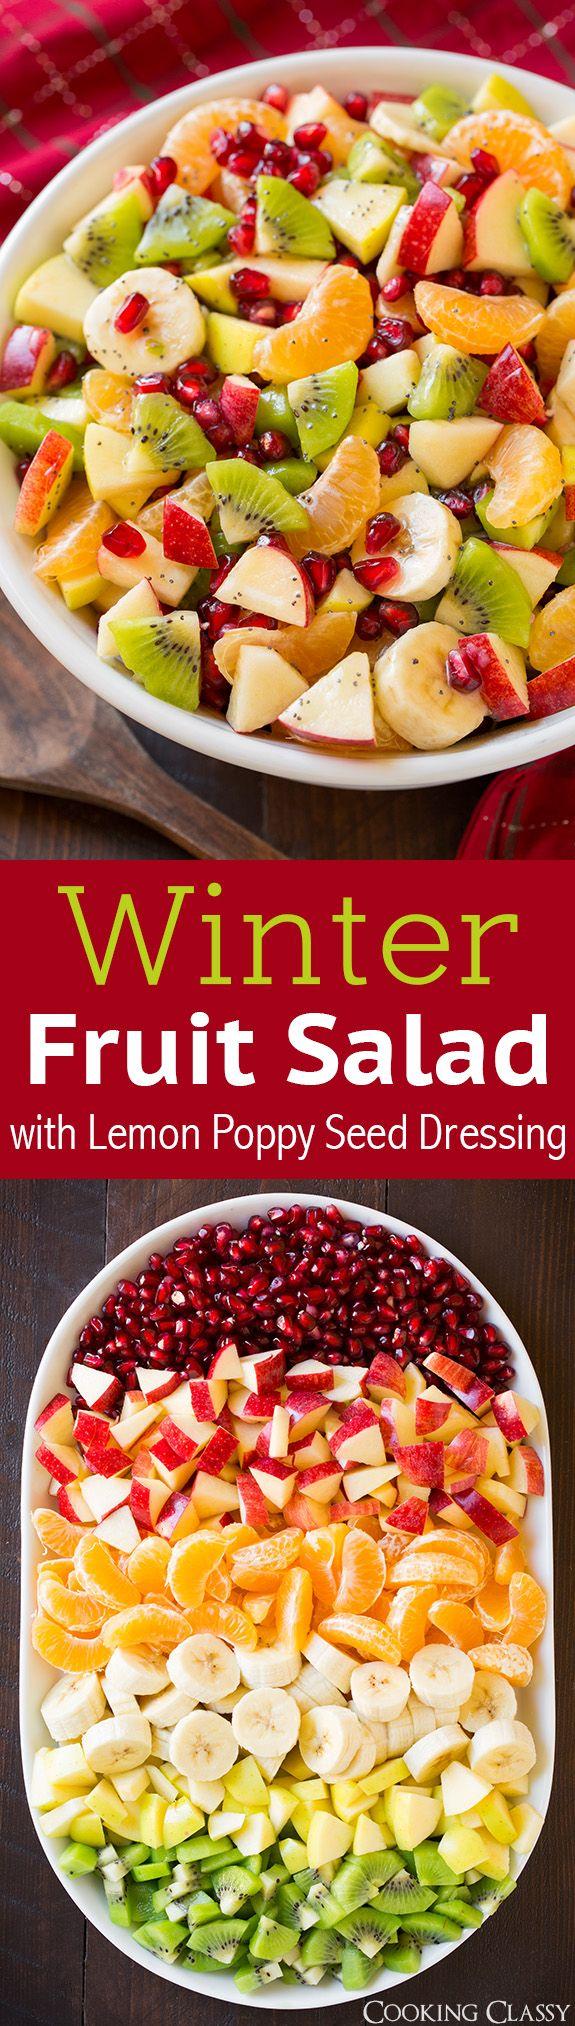 Winter Fruit Salad with Lemon Poppy Seed Dressing